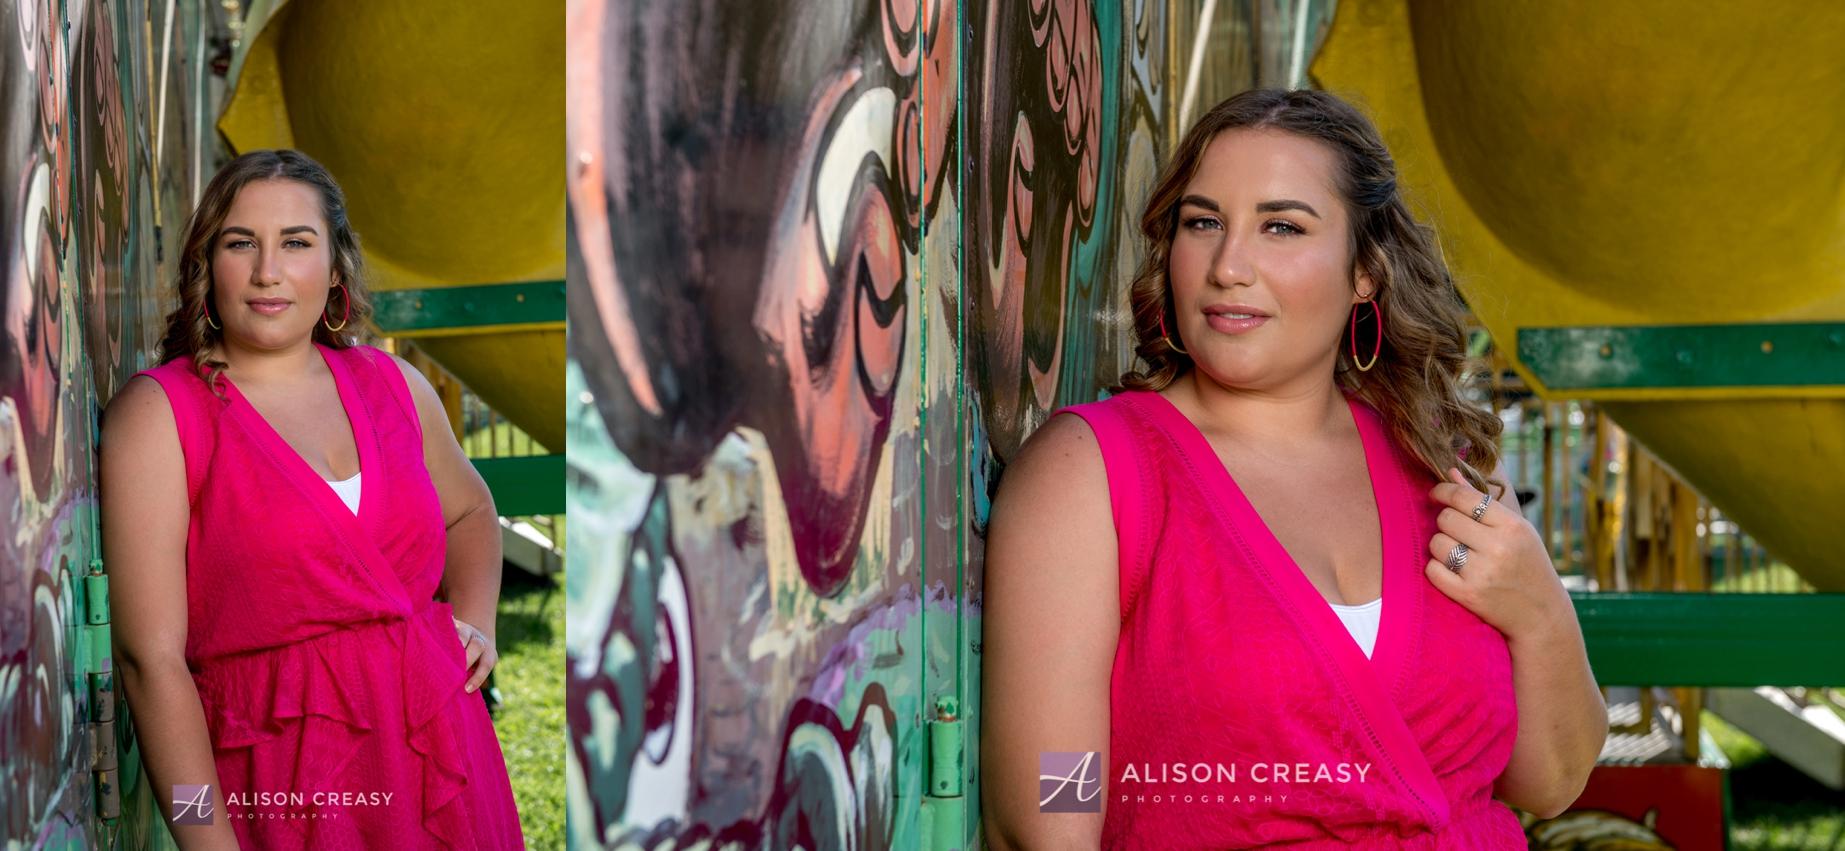 Alison-Creasy-Photography-Lynchburg-VA-Senior- Photographer_0002.jpg